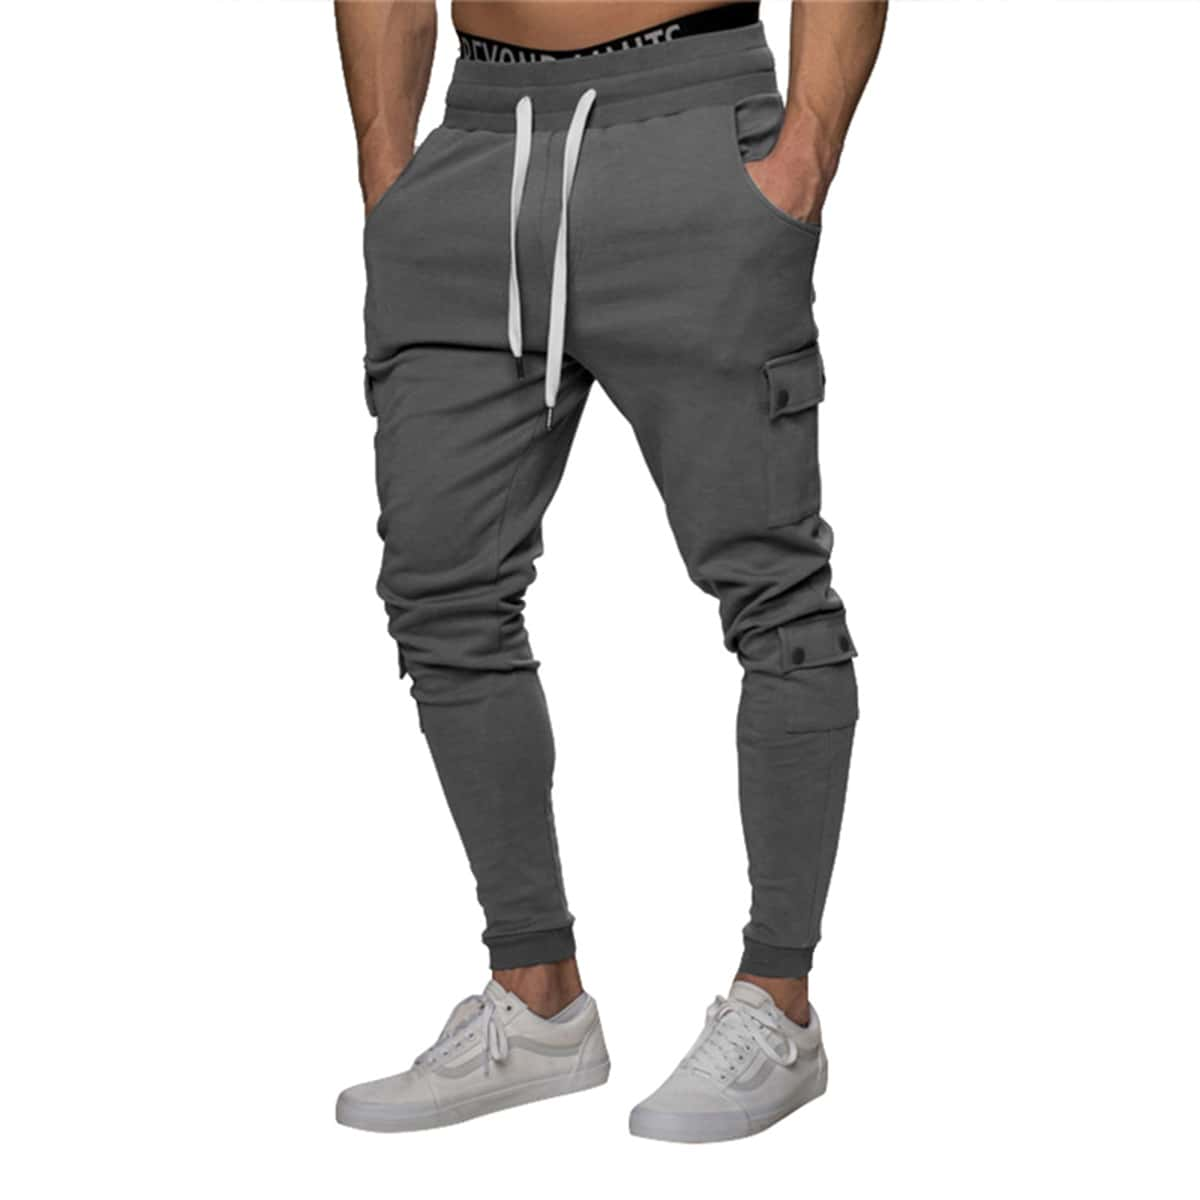 Men Side Flap Pocket Drawstring Waist Sweatpants